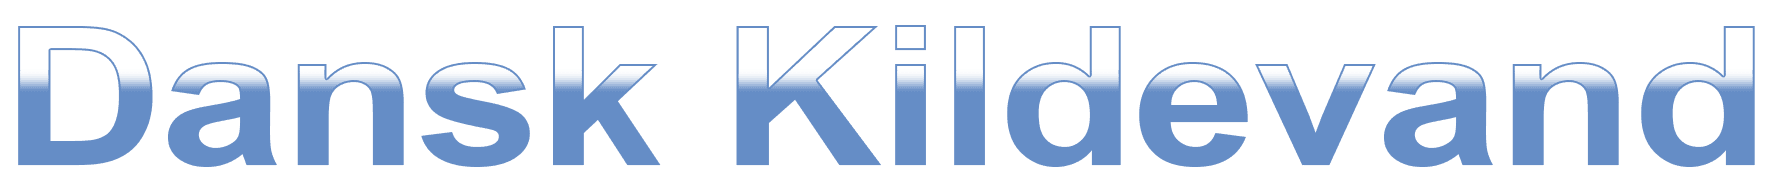 portfolio,freelance,web developer,videograper,Luxpro, LuxPro.eu